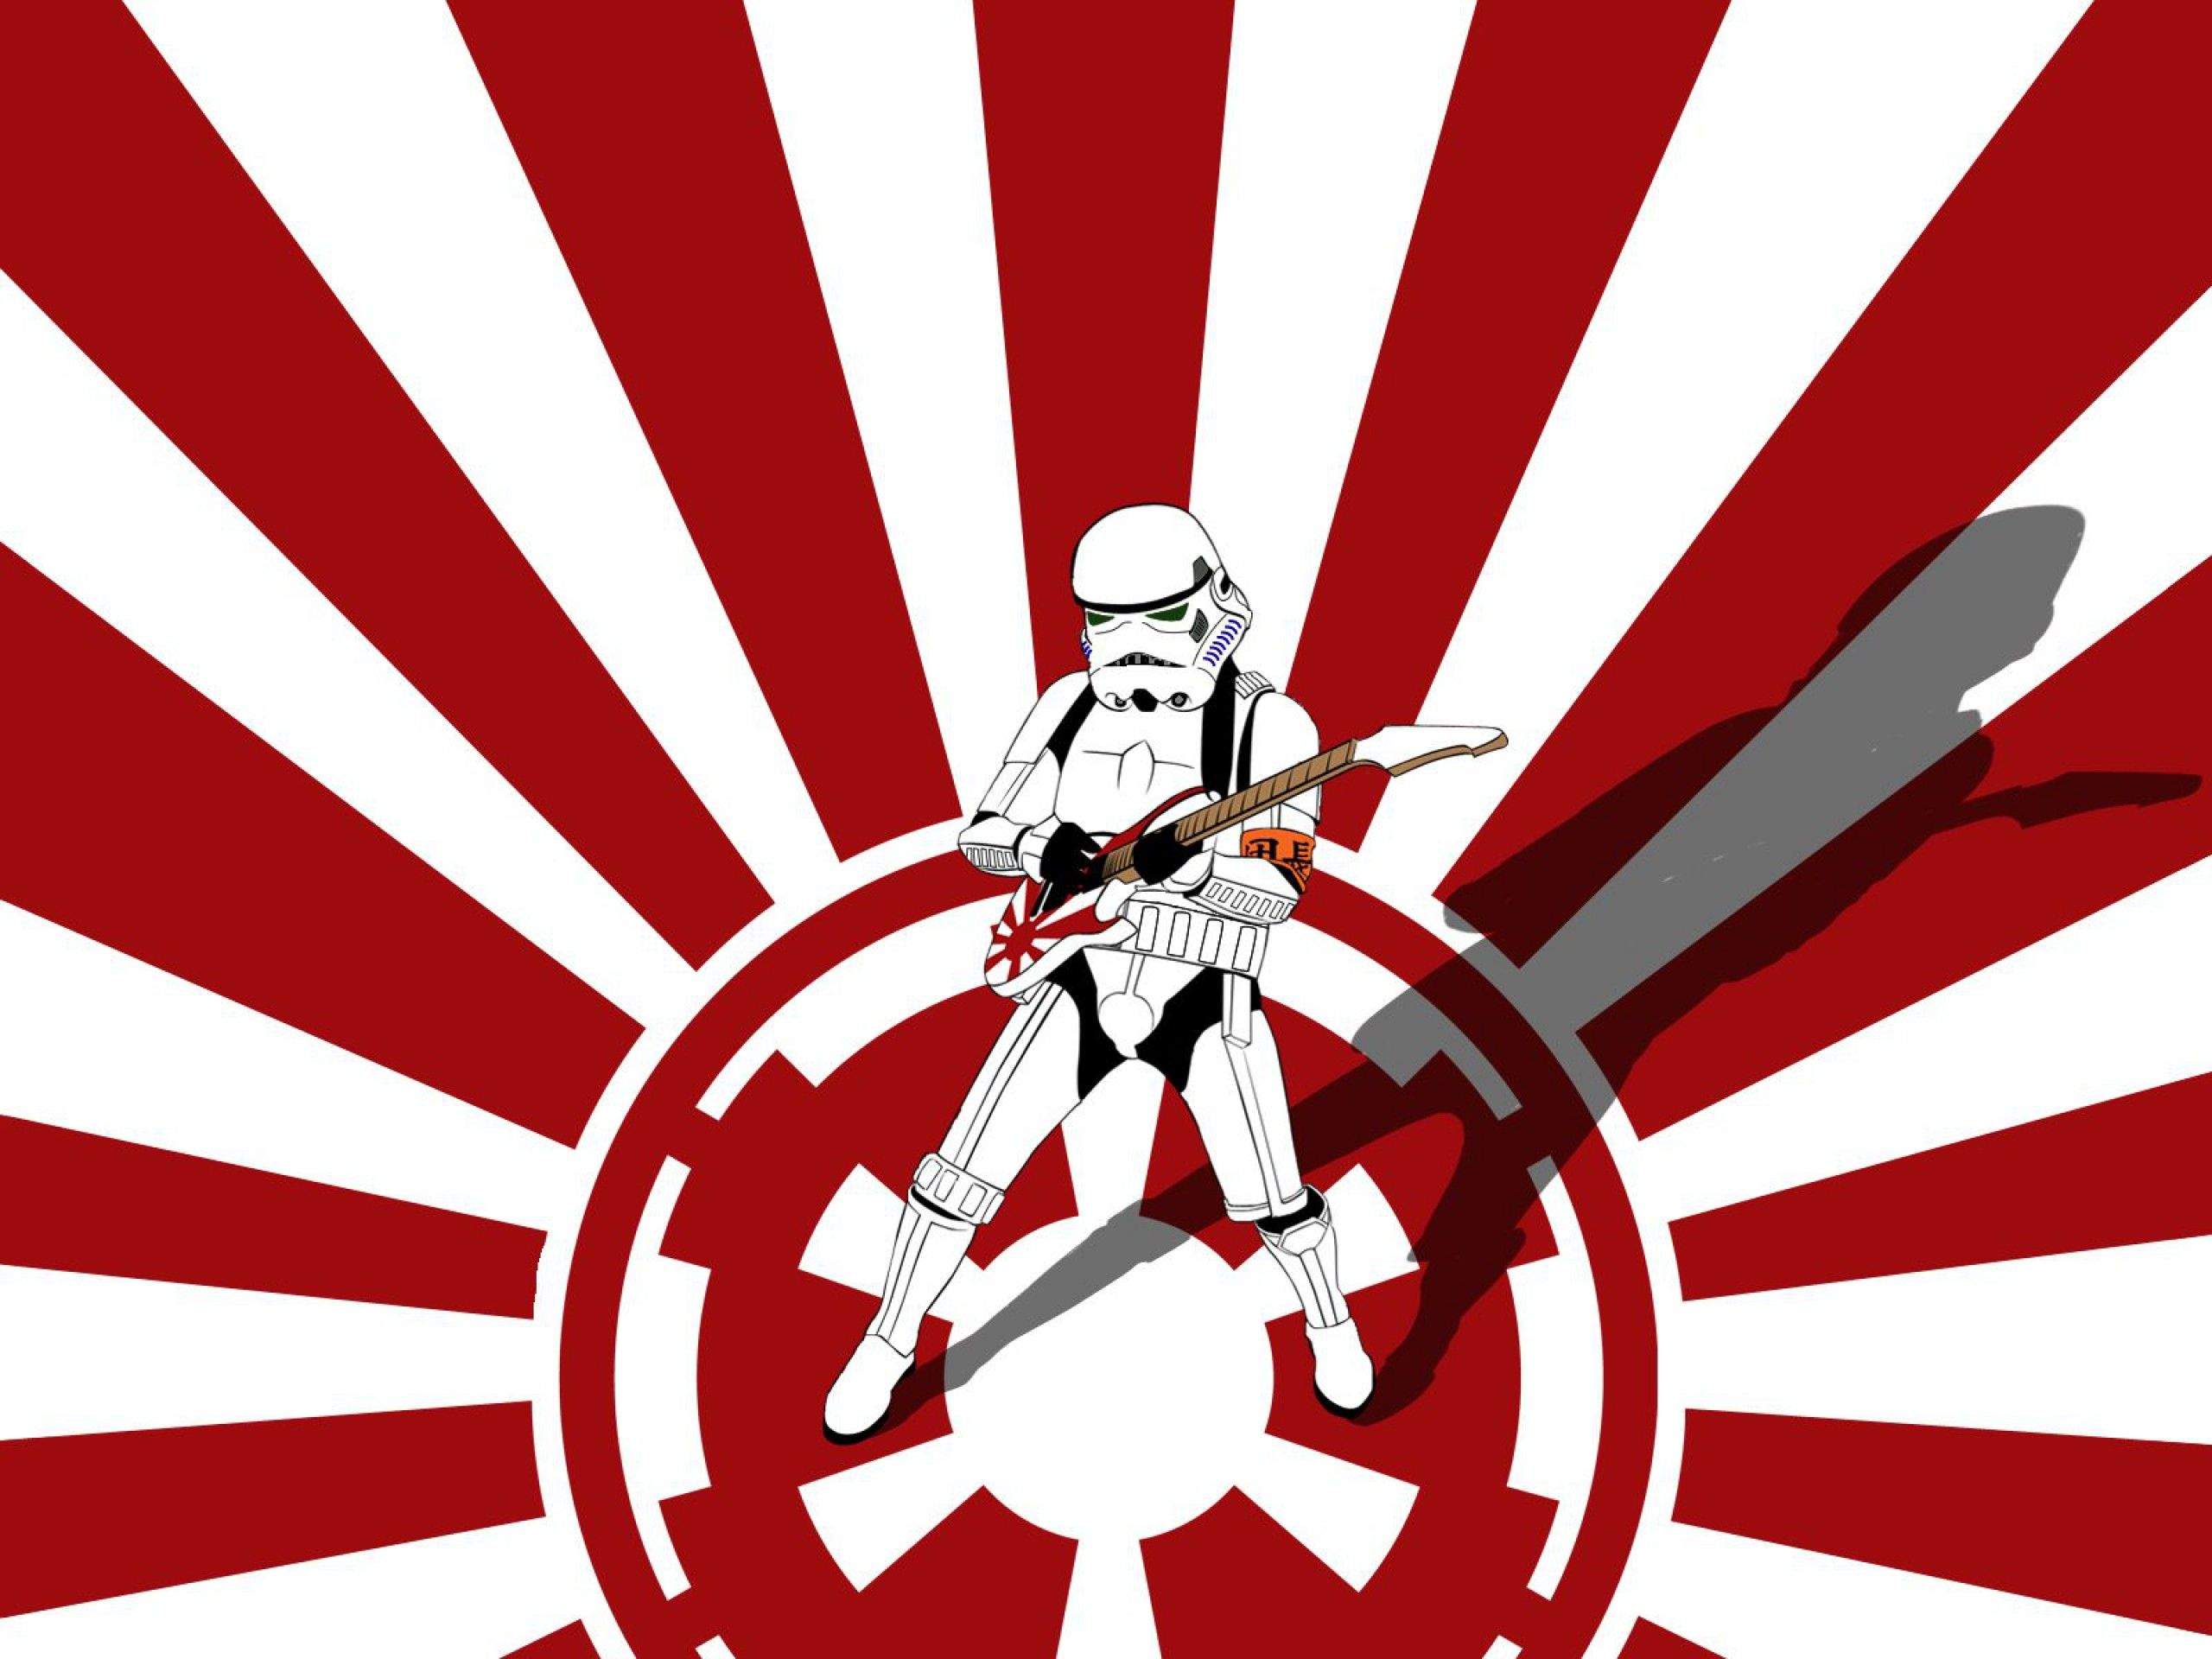 Guitar Galactic Empire Stormtrooper Japan Star Wars Wallpaper Star Wars Art Art